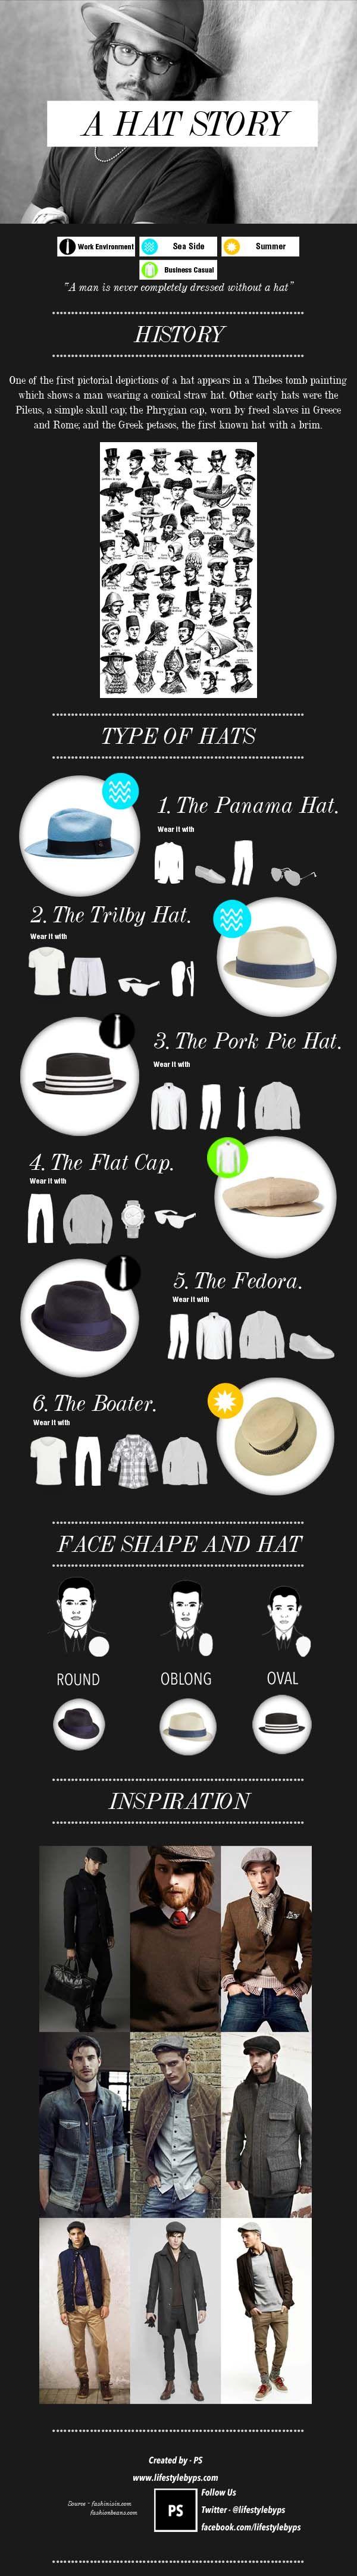 262 best capsule wardrobe him images on Pinterest